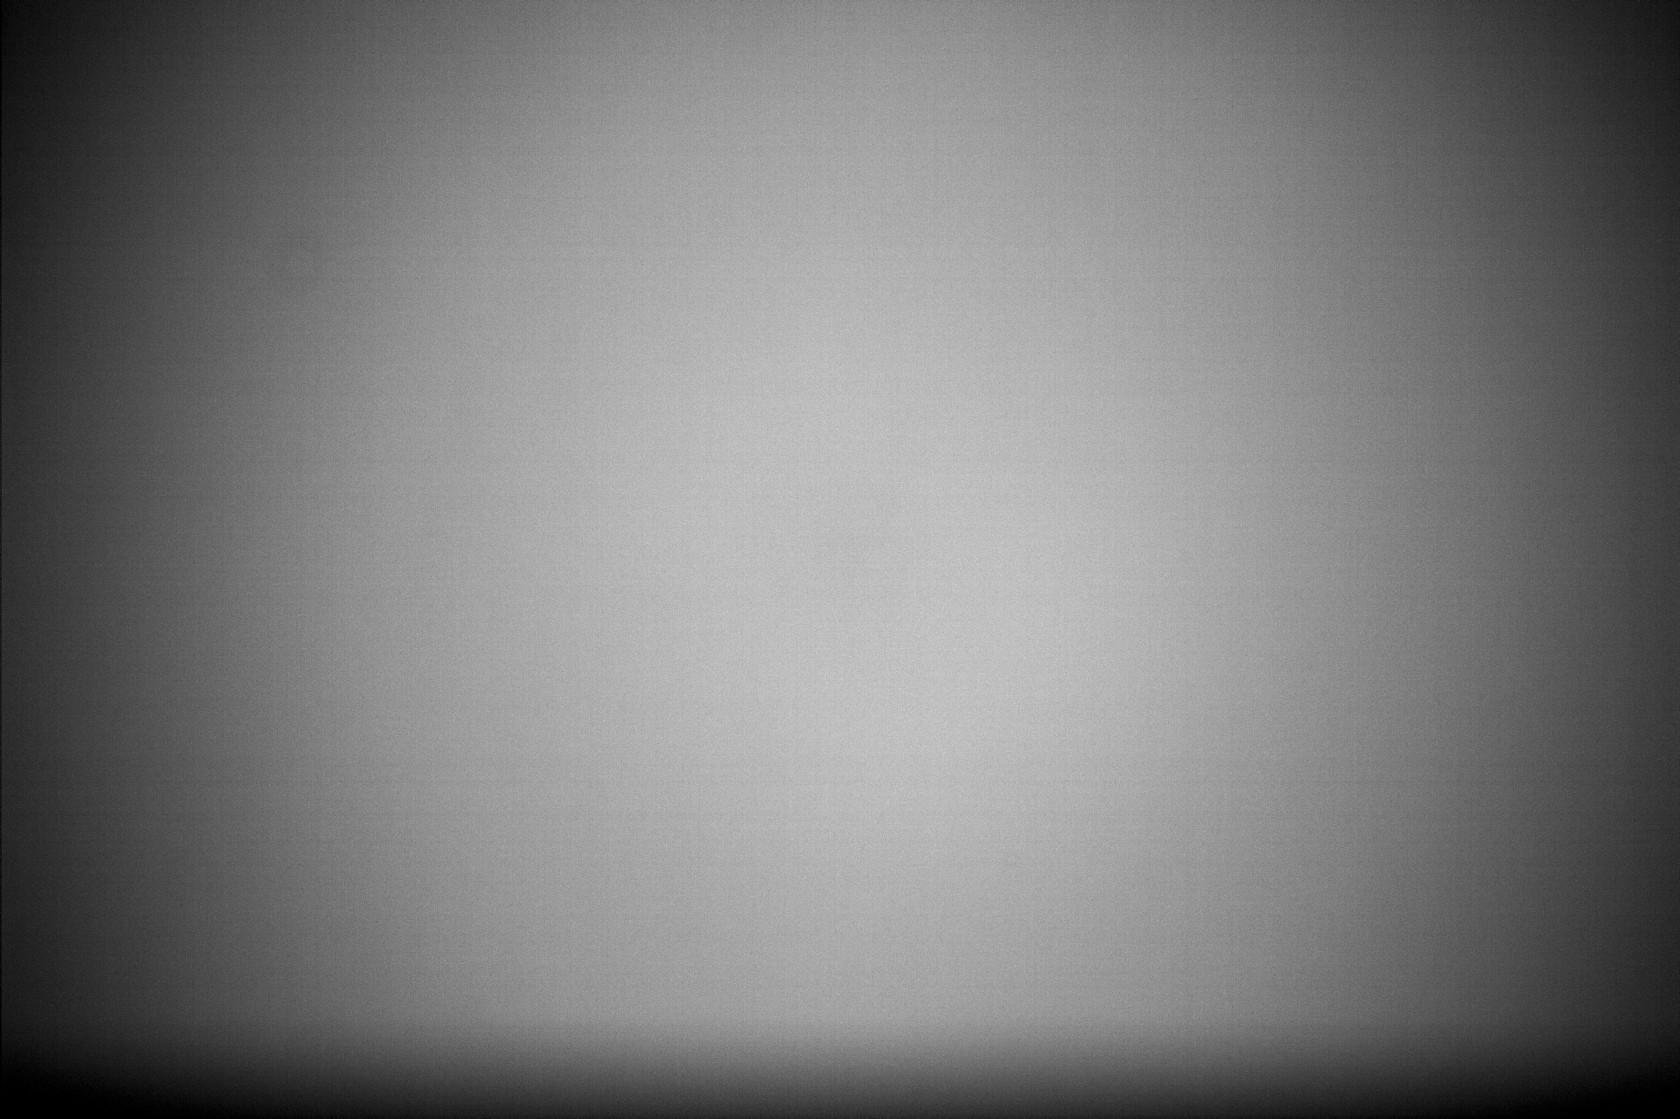 flat_dust.jpg